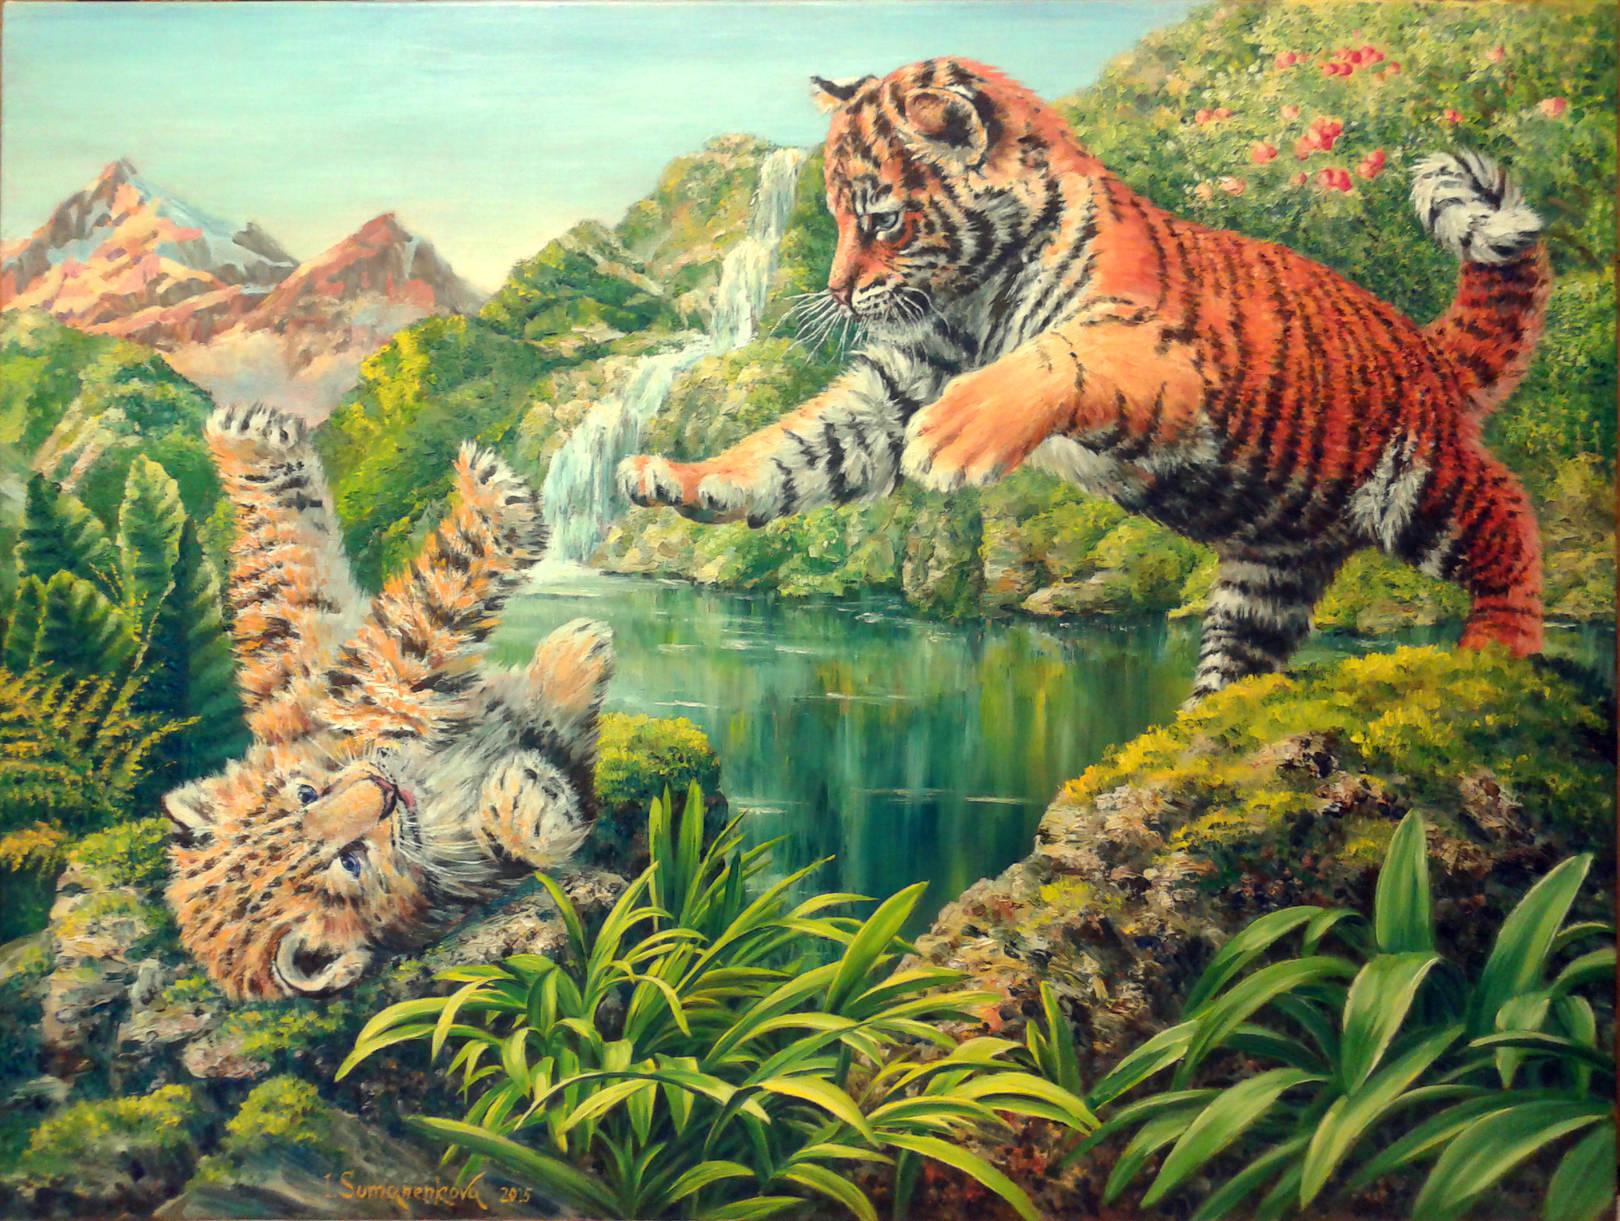 Где-то в джунглях Индии / Somewhere in jungle... 60 х 80 см, холст, масло, 2015 г